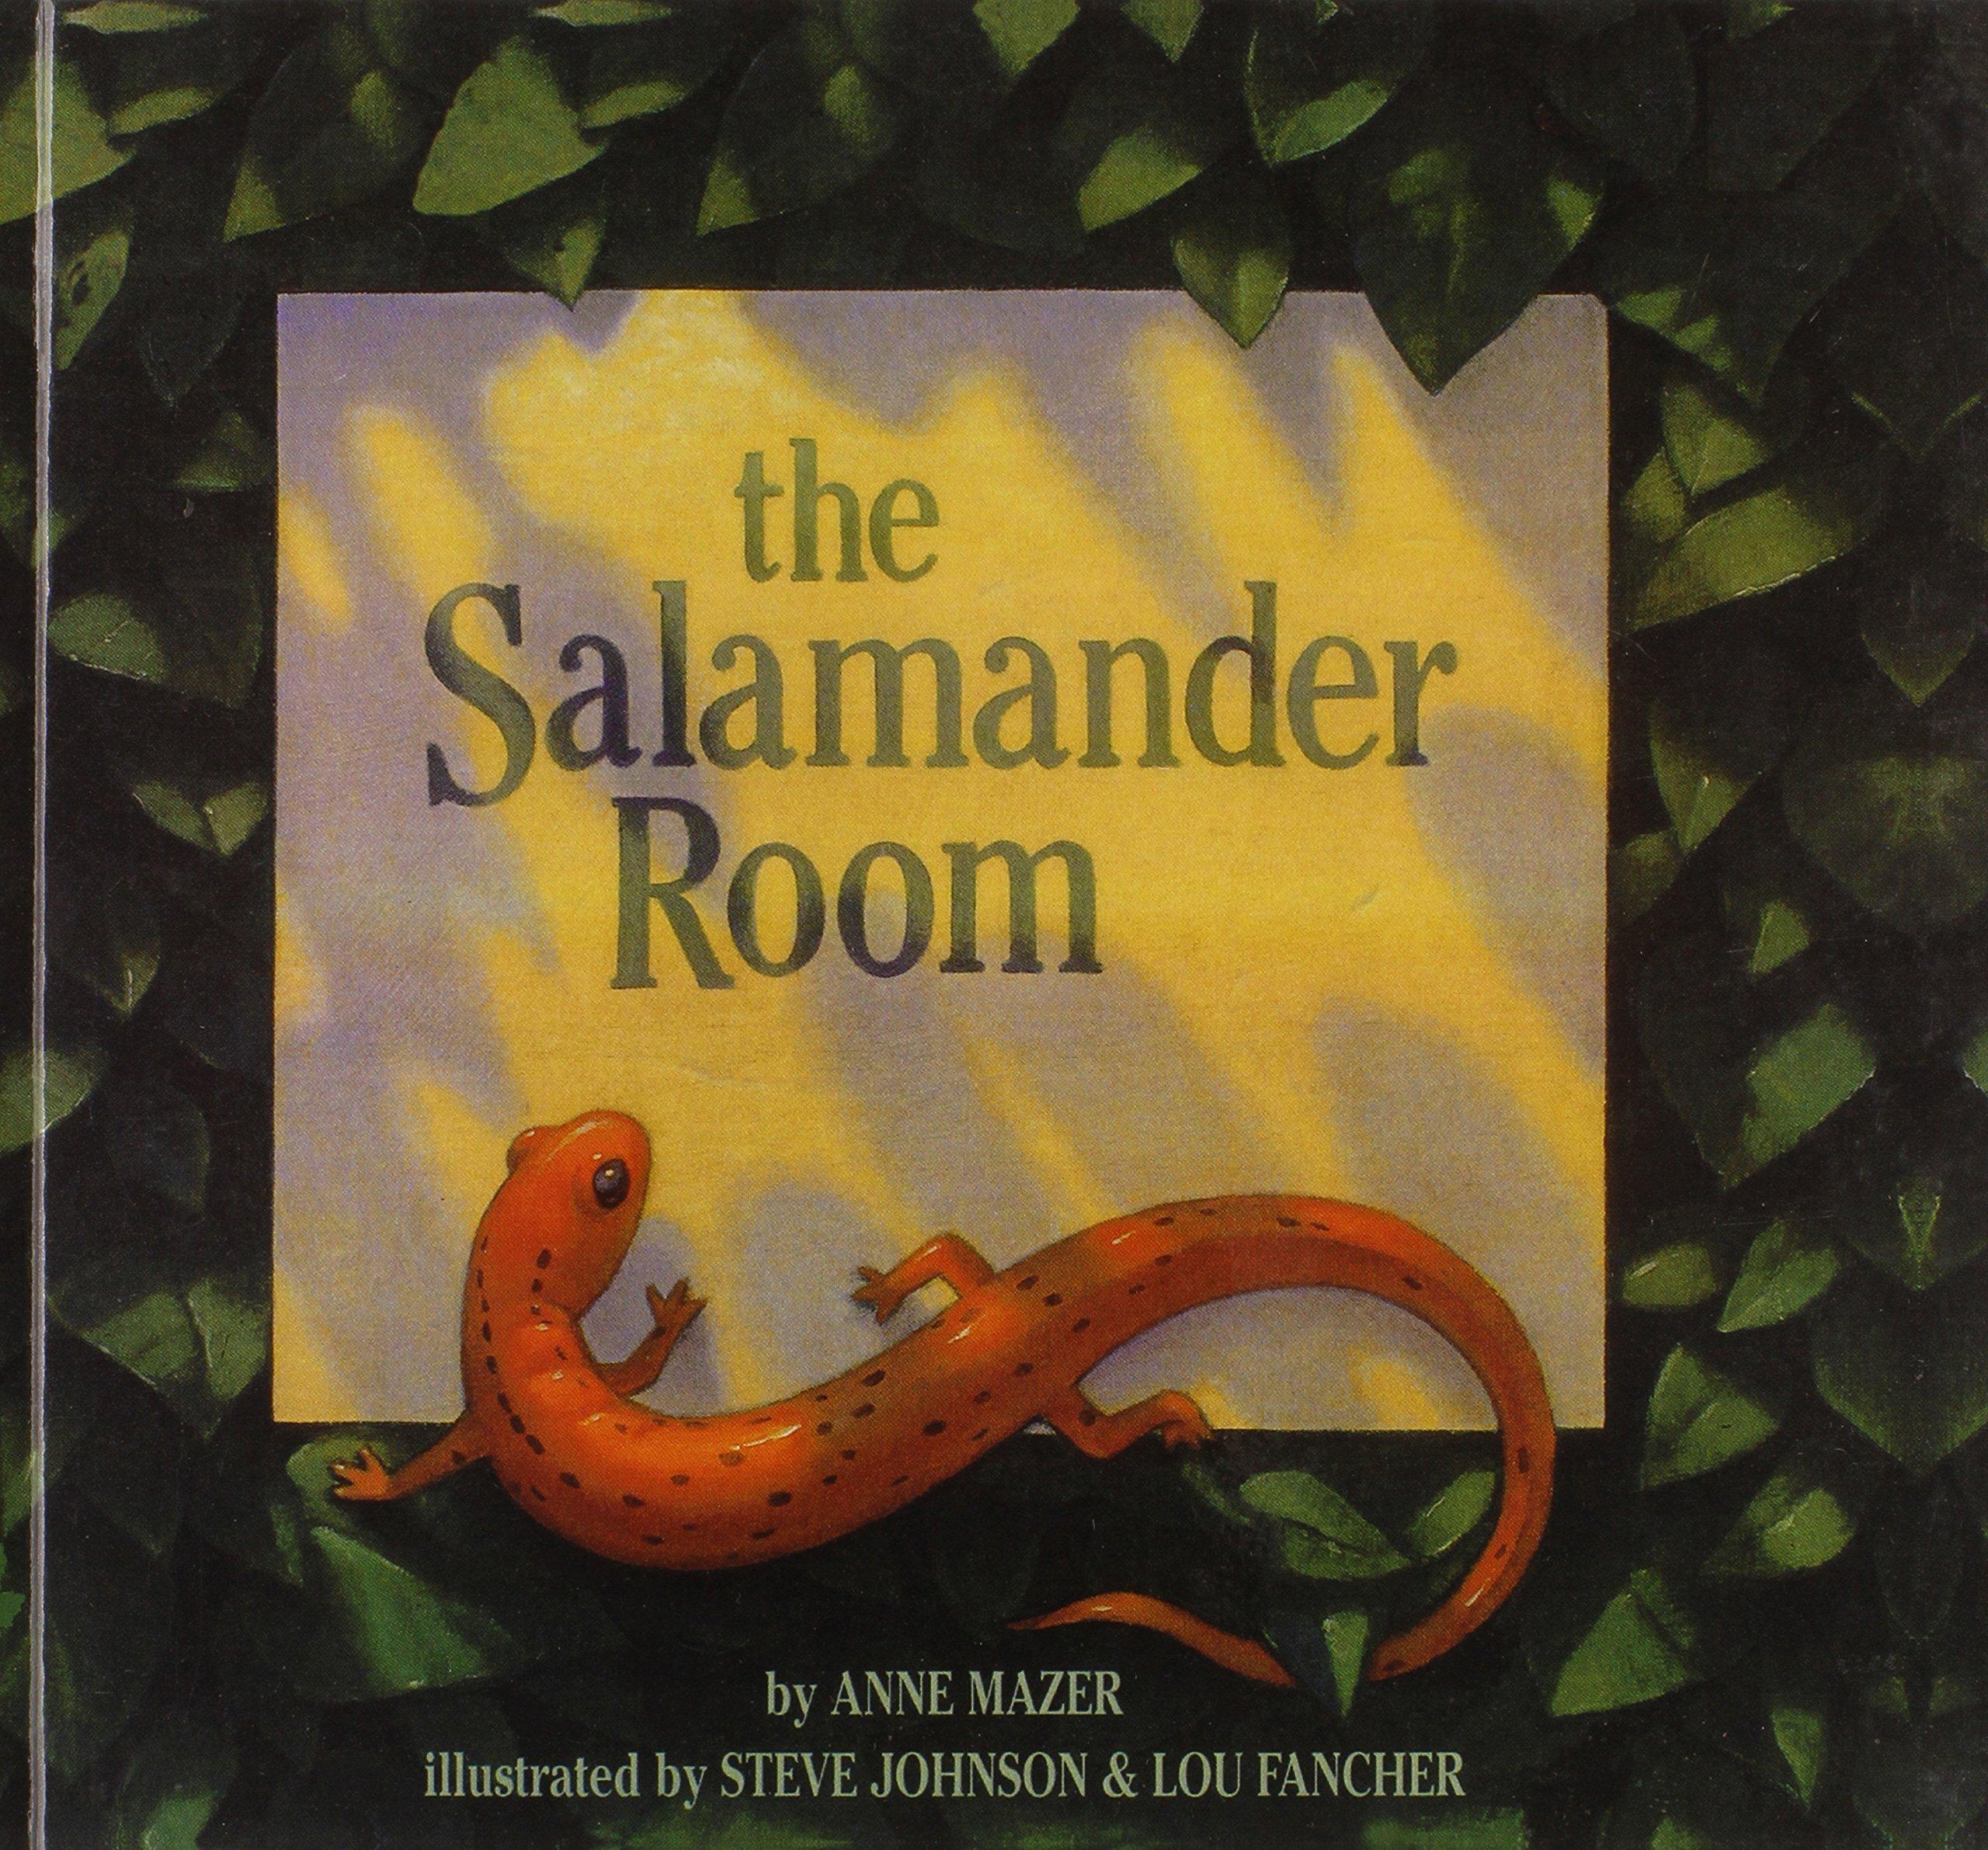 The Salamander Room (Turtleback School & Library Binding Edition)